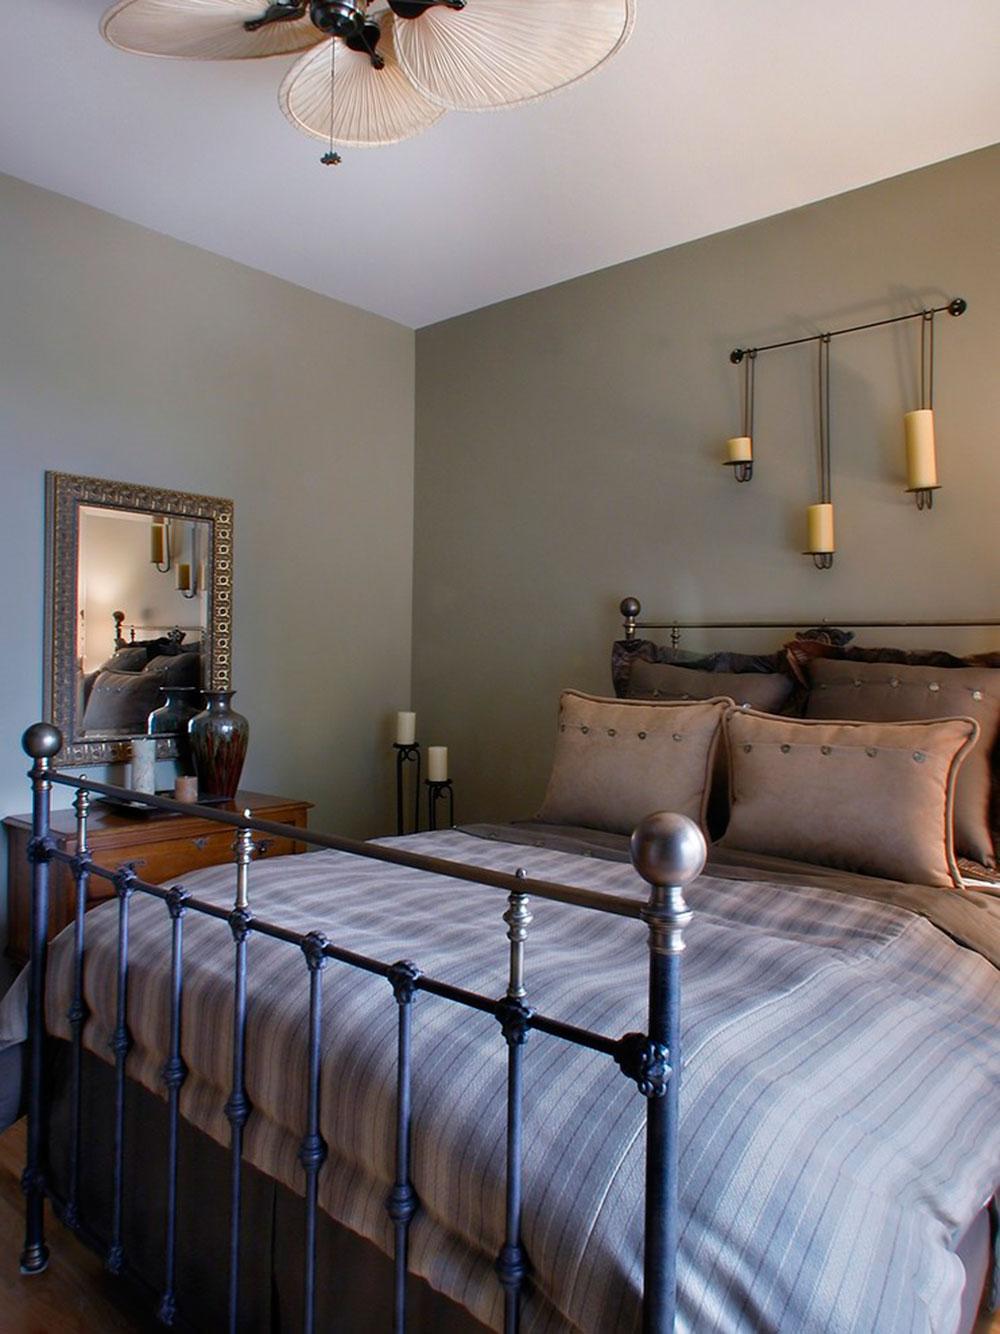 Vintage-pad-by-Van-H-Robinson vintage bedroom ideas that shouldn't be overlooked